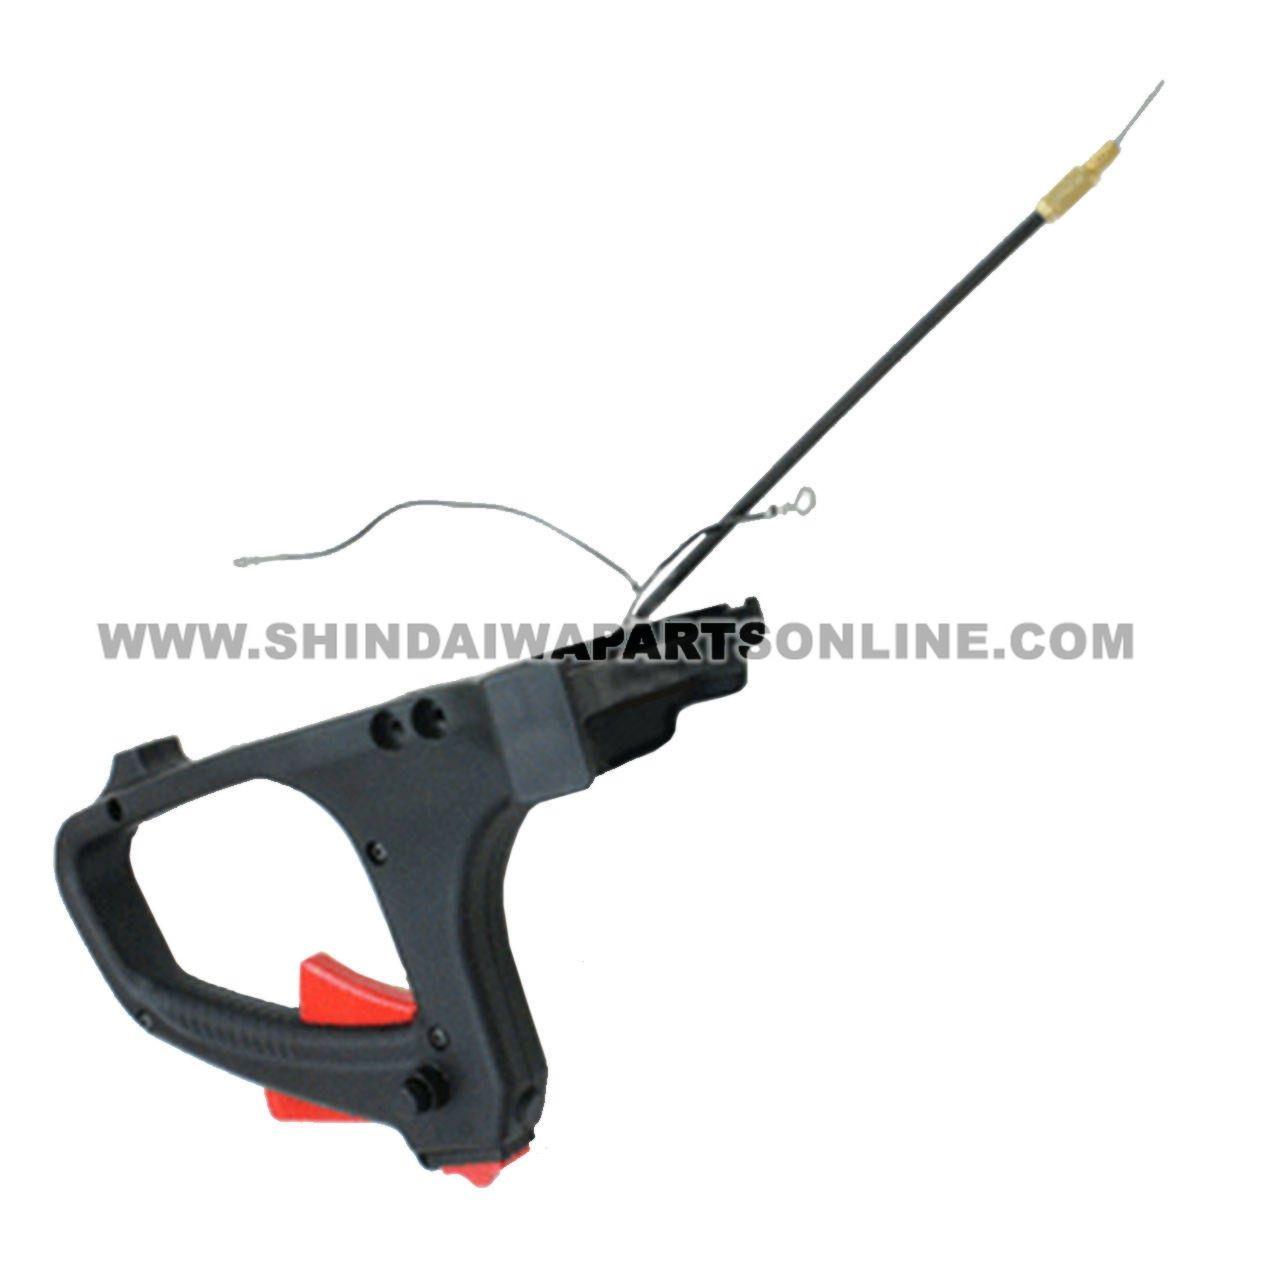 Shindaiwa C041000550 - Assy Rear Handle